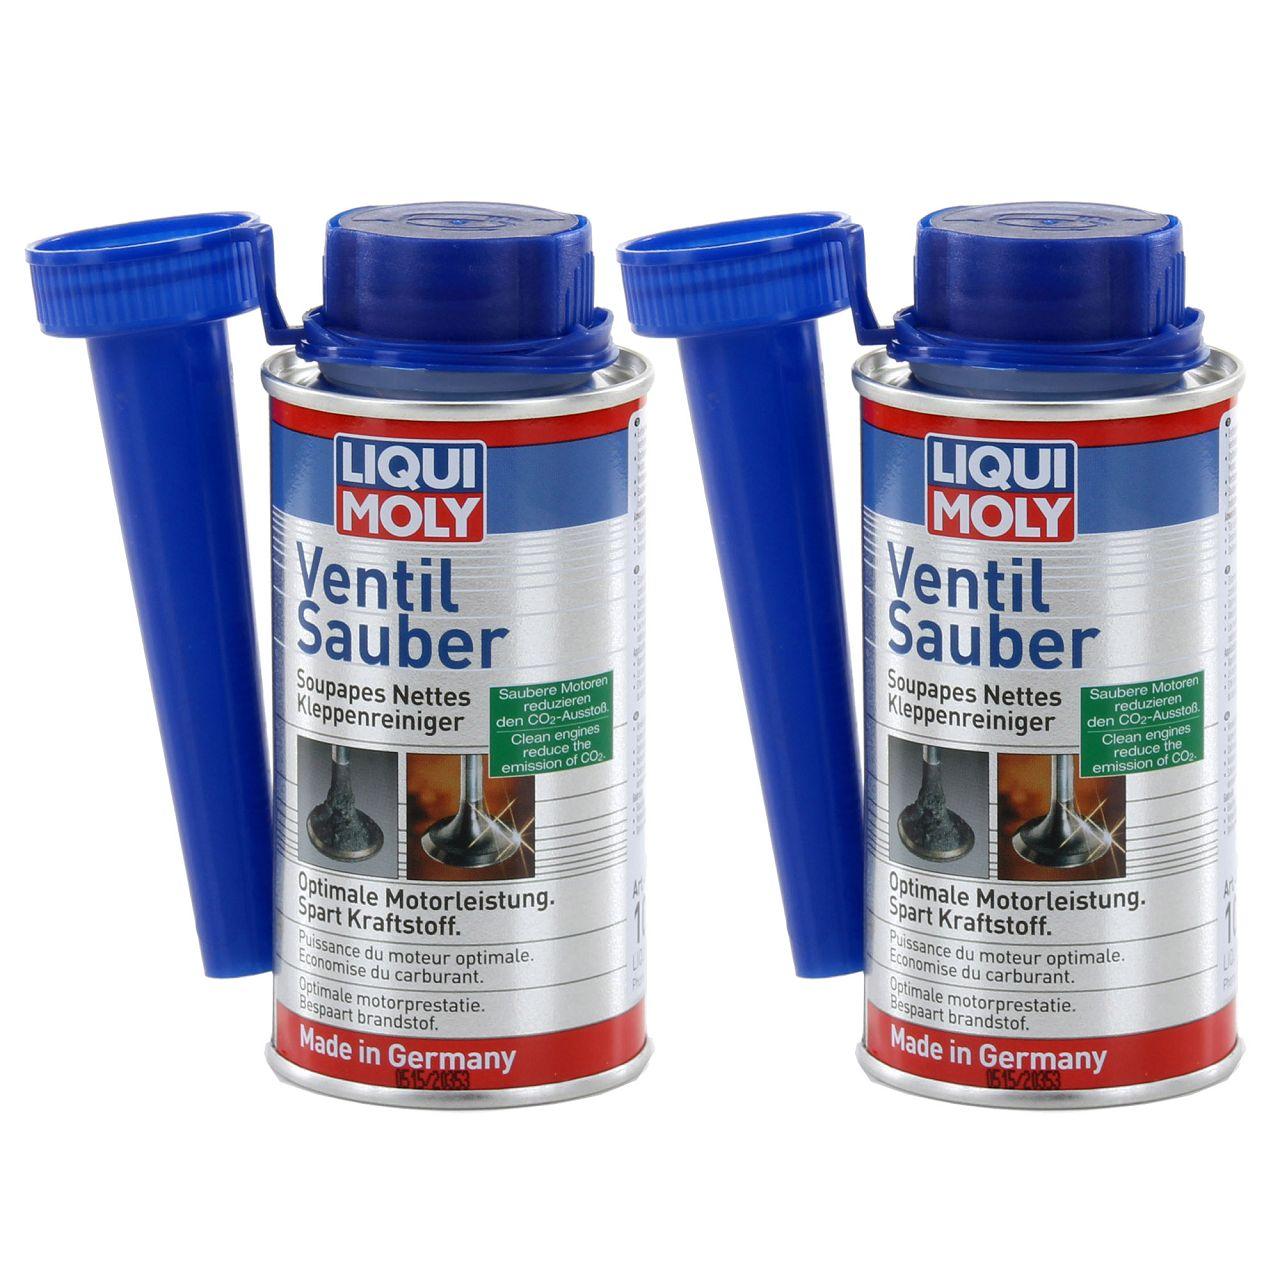 2x 150ml LIQUI MOLY Ventil Sauber Reiniger Kraftstoff Benzin Additiv 1014